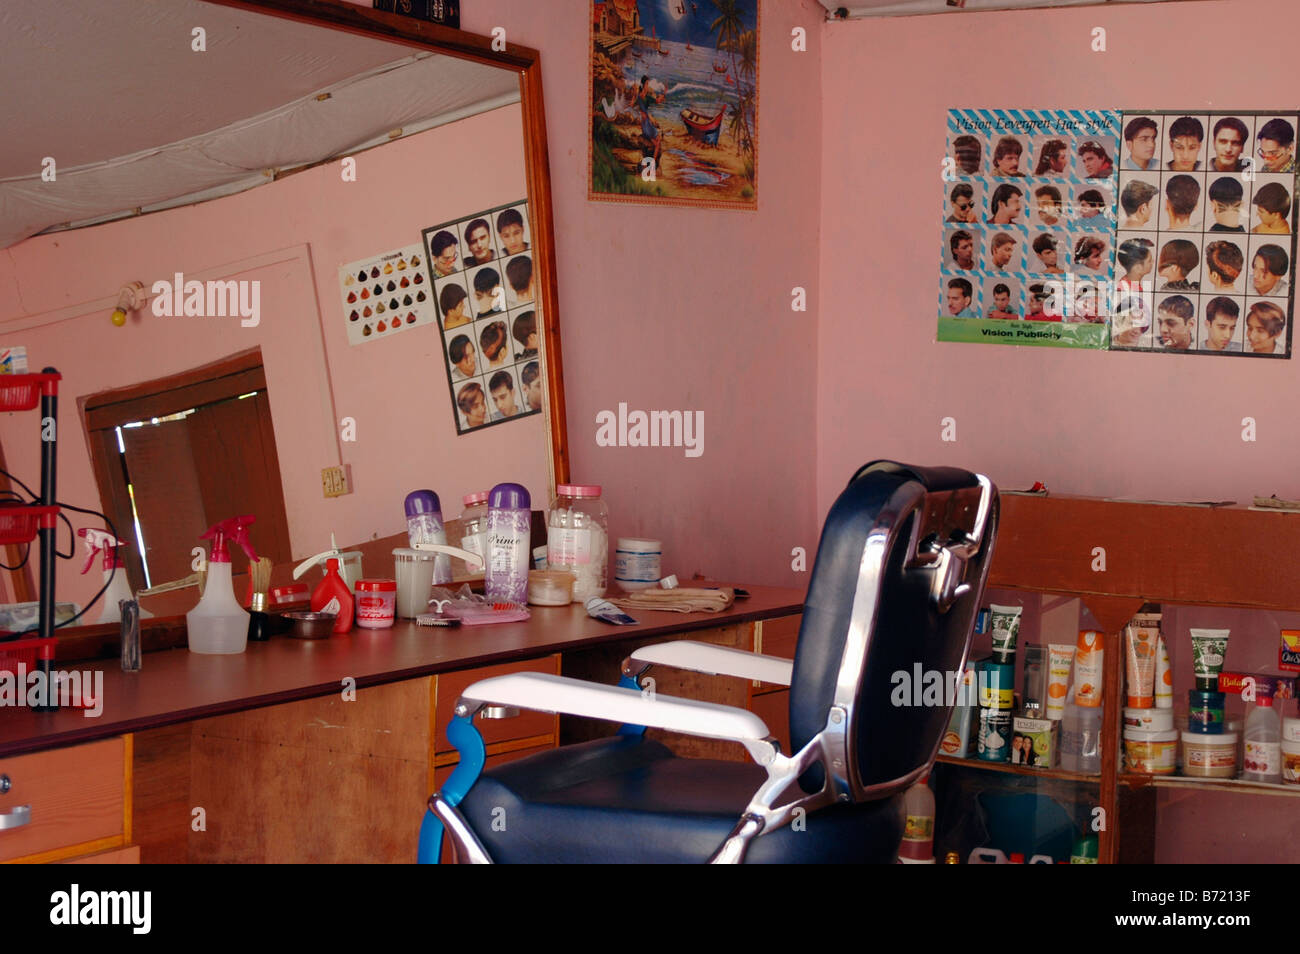 indian barber shop stockfotos und